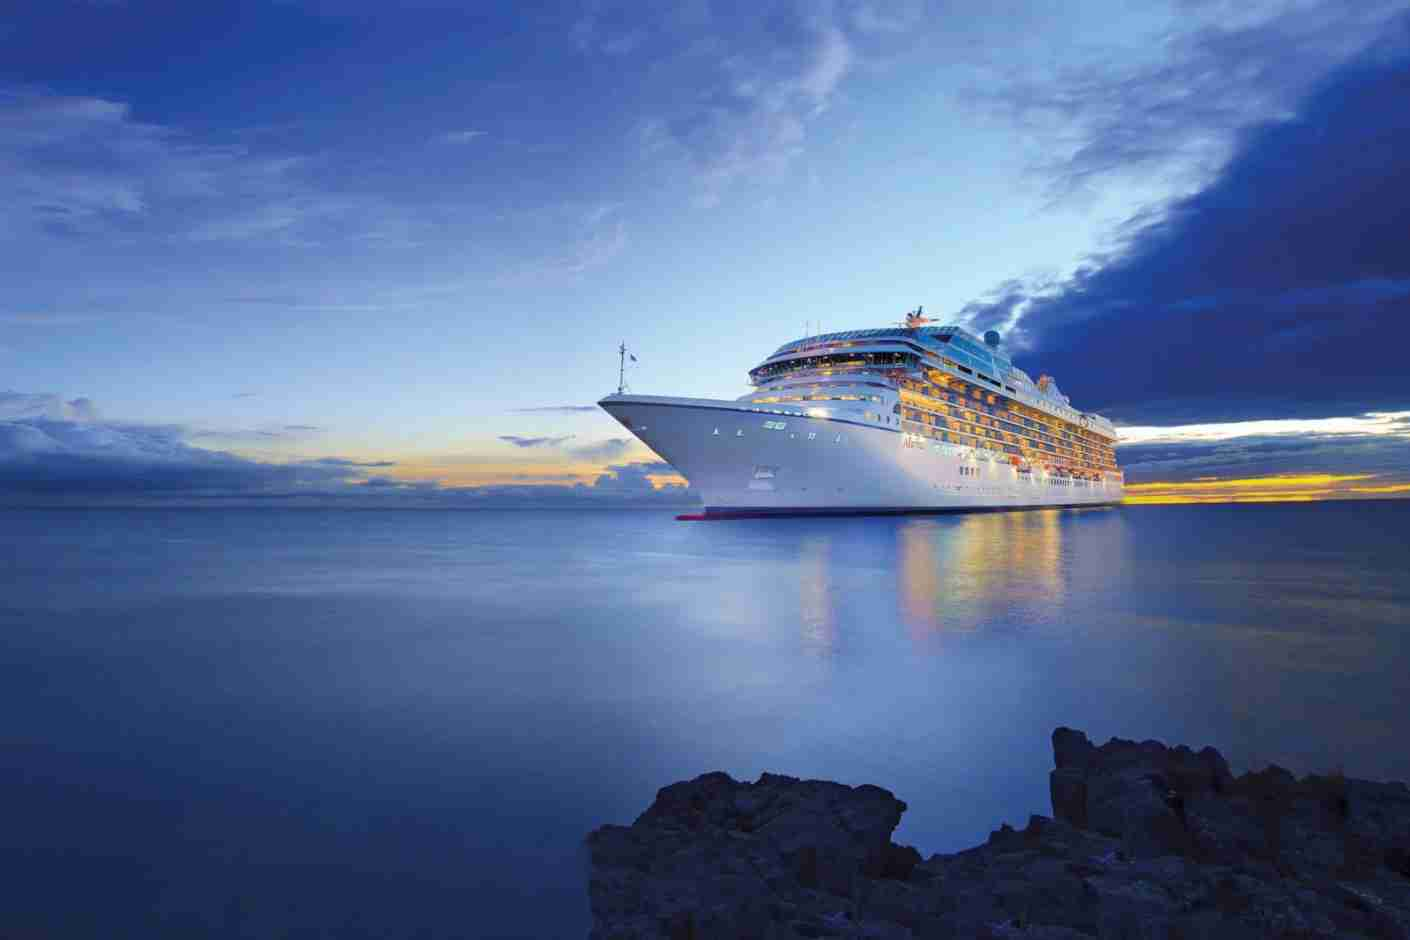 An Oceania Cruise liner. (Photo courtesy Oceania Cruises Blog)